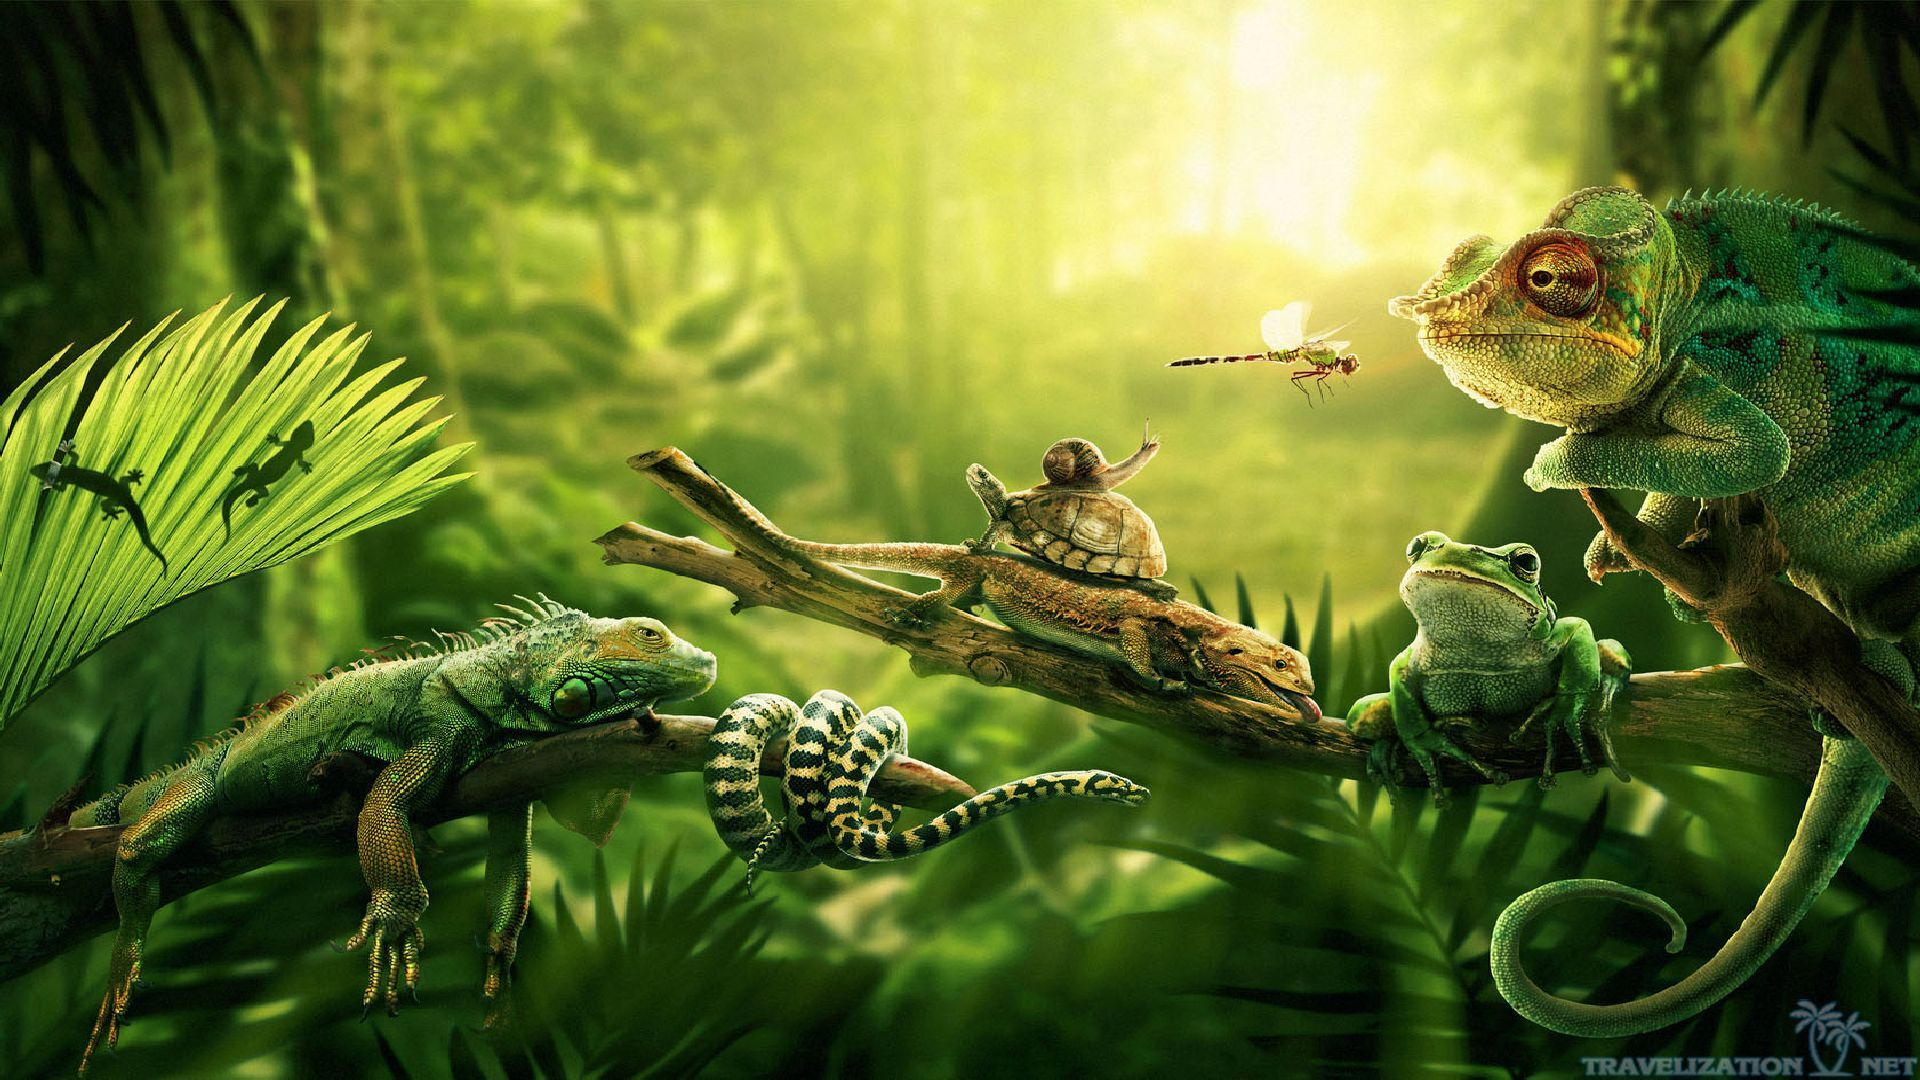 Amazon Rainforest Wallpaper Full HD bGn Jungla